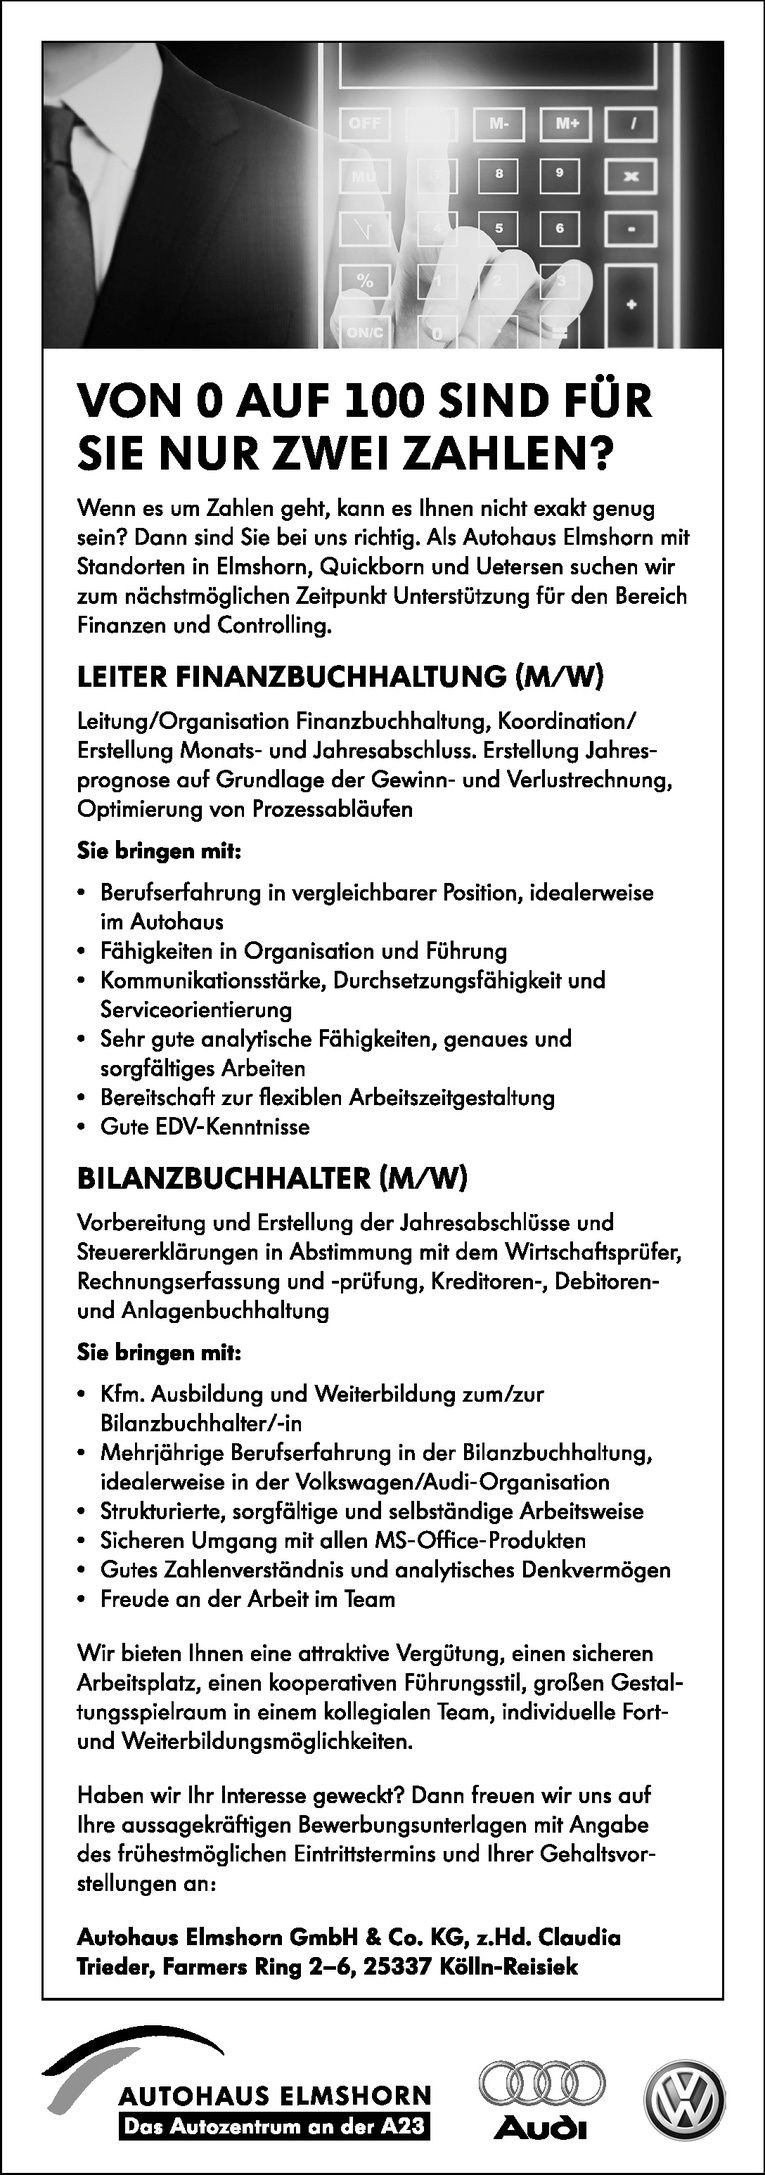 BILANZBUCHHALTER (M/W)